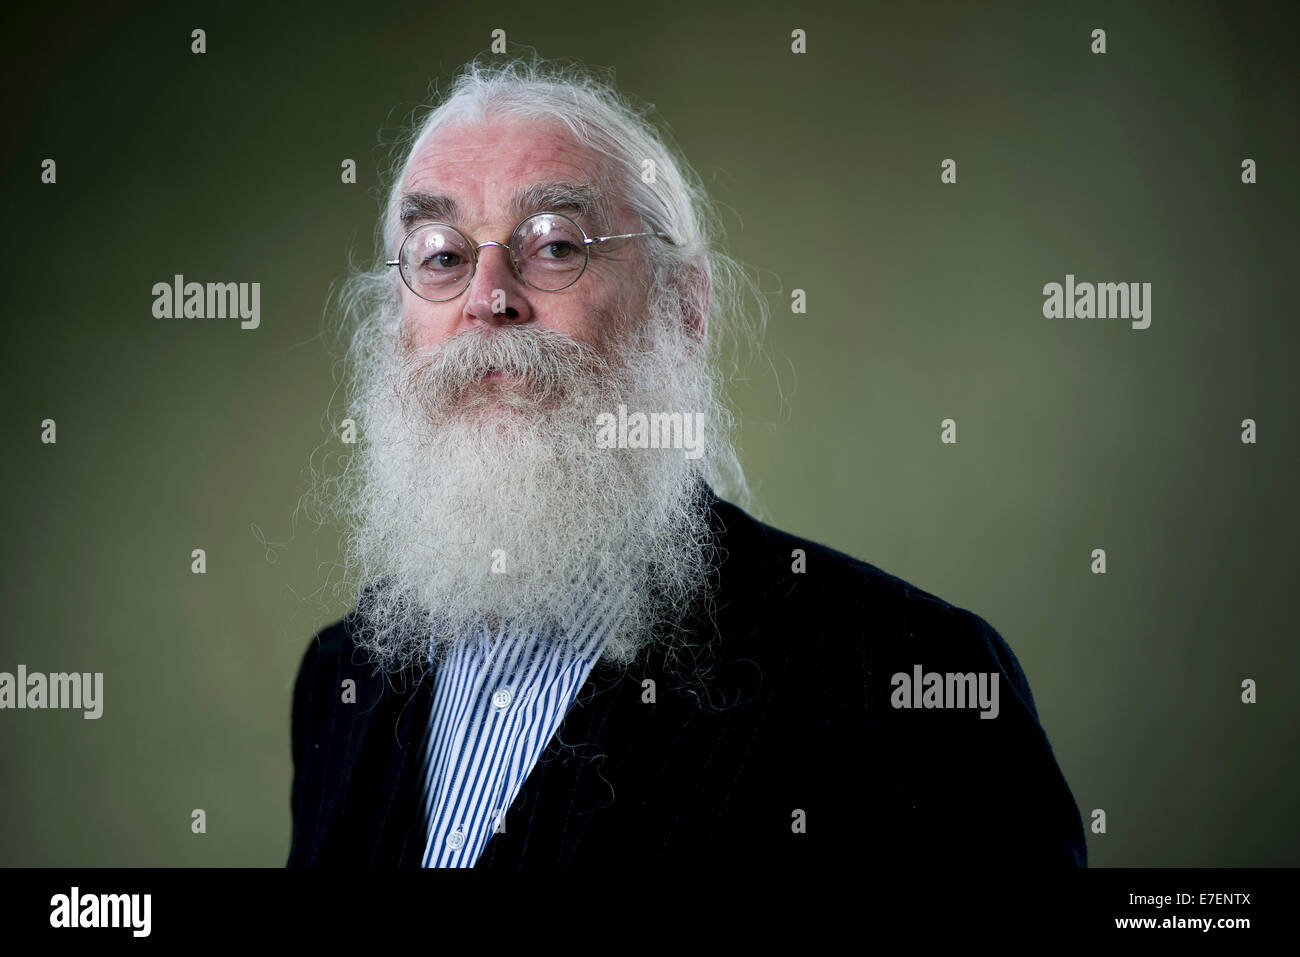 British archaeologist and Assyriologist Irving Finkel appears at the Edinburgh International Book Festival. - Stock Image